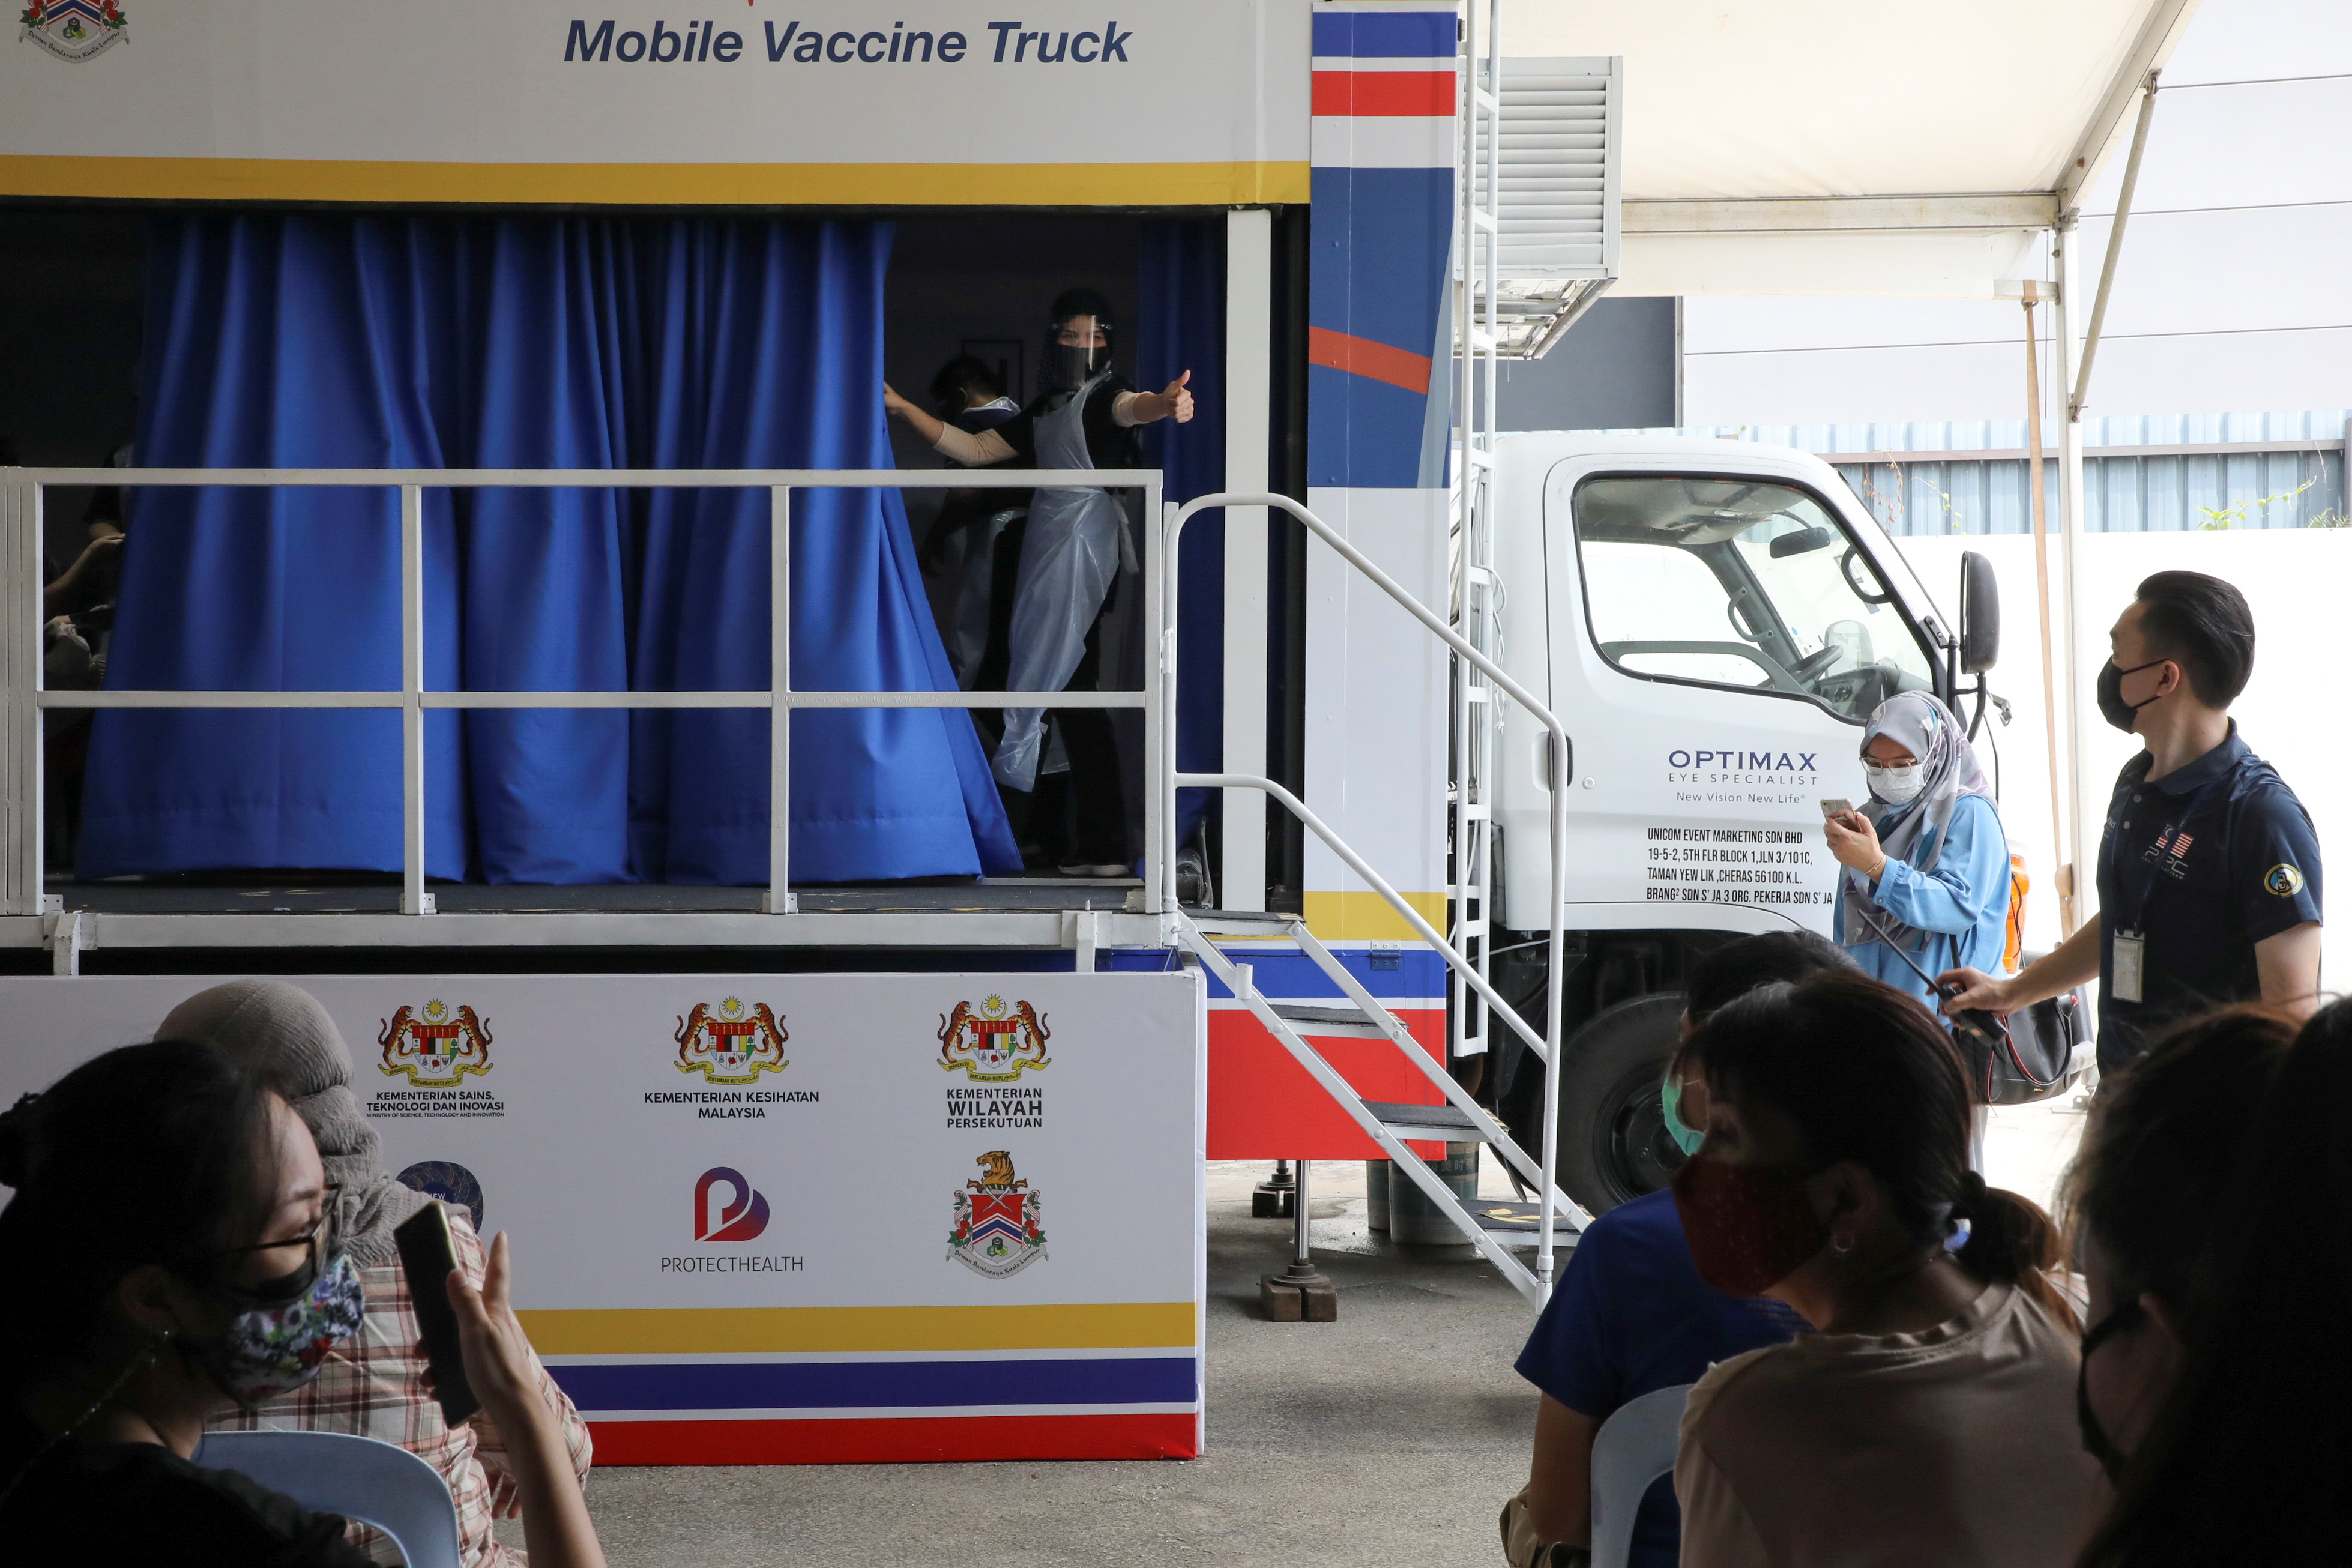 A medical worker gestures inside a coronavirus disease (COVID-19) vaccination truck in Kuala Lumpur, Malaysia June 8, 2021. REUTERS/Lim Huey Teng